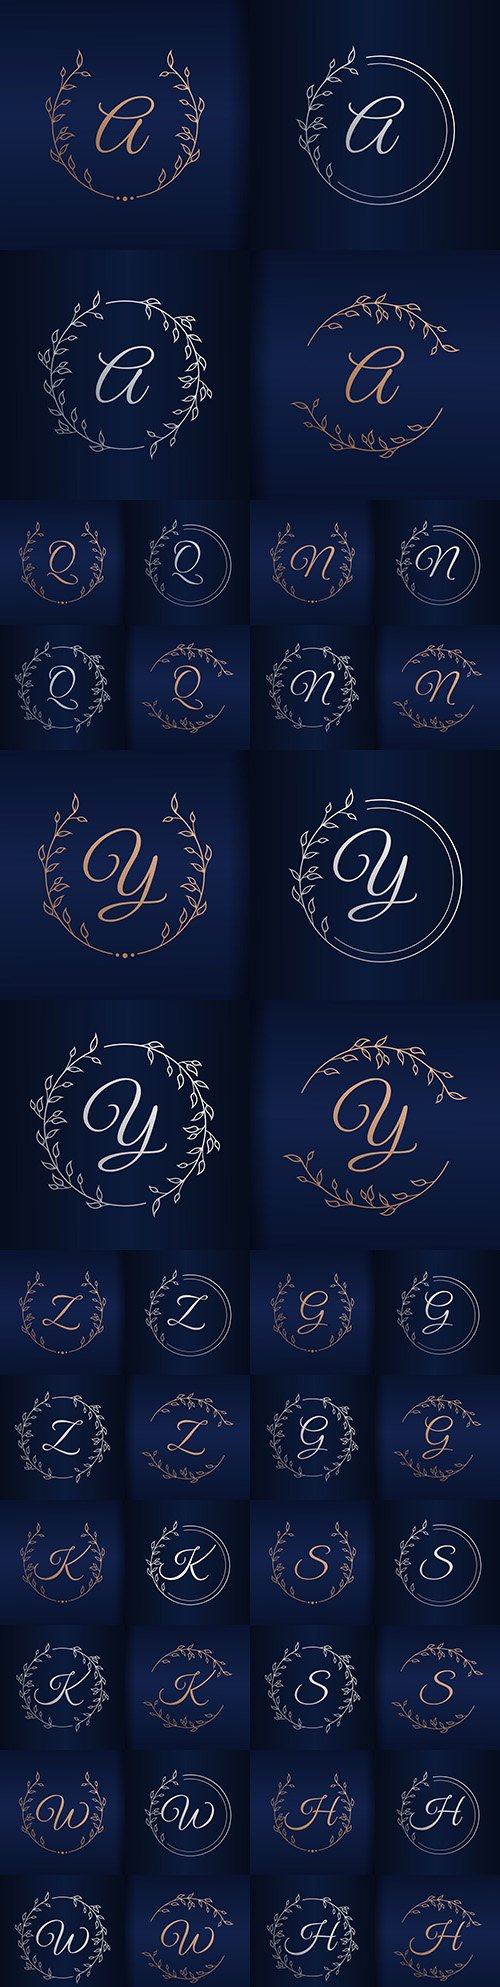 Capital letter floral decorative frame alphabet 3